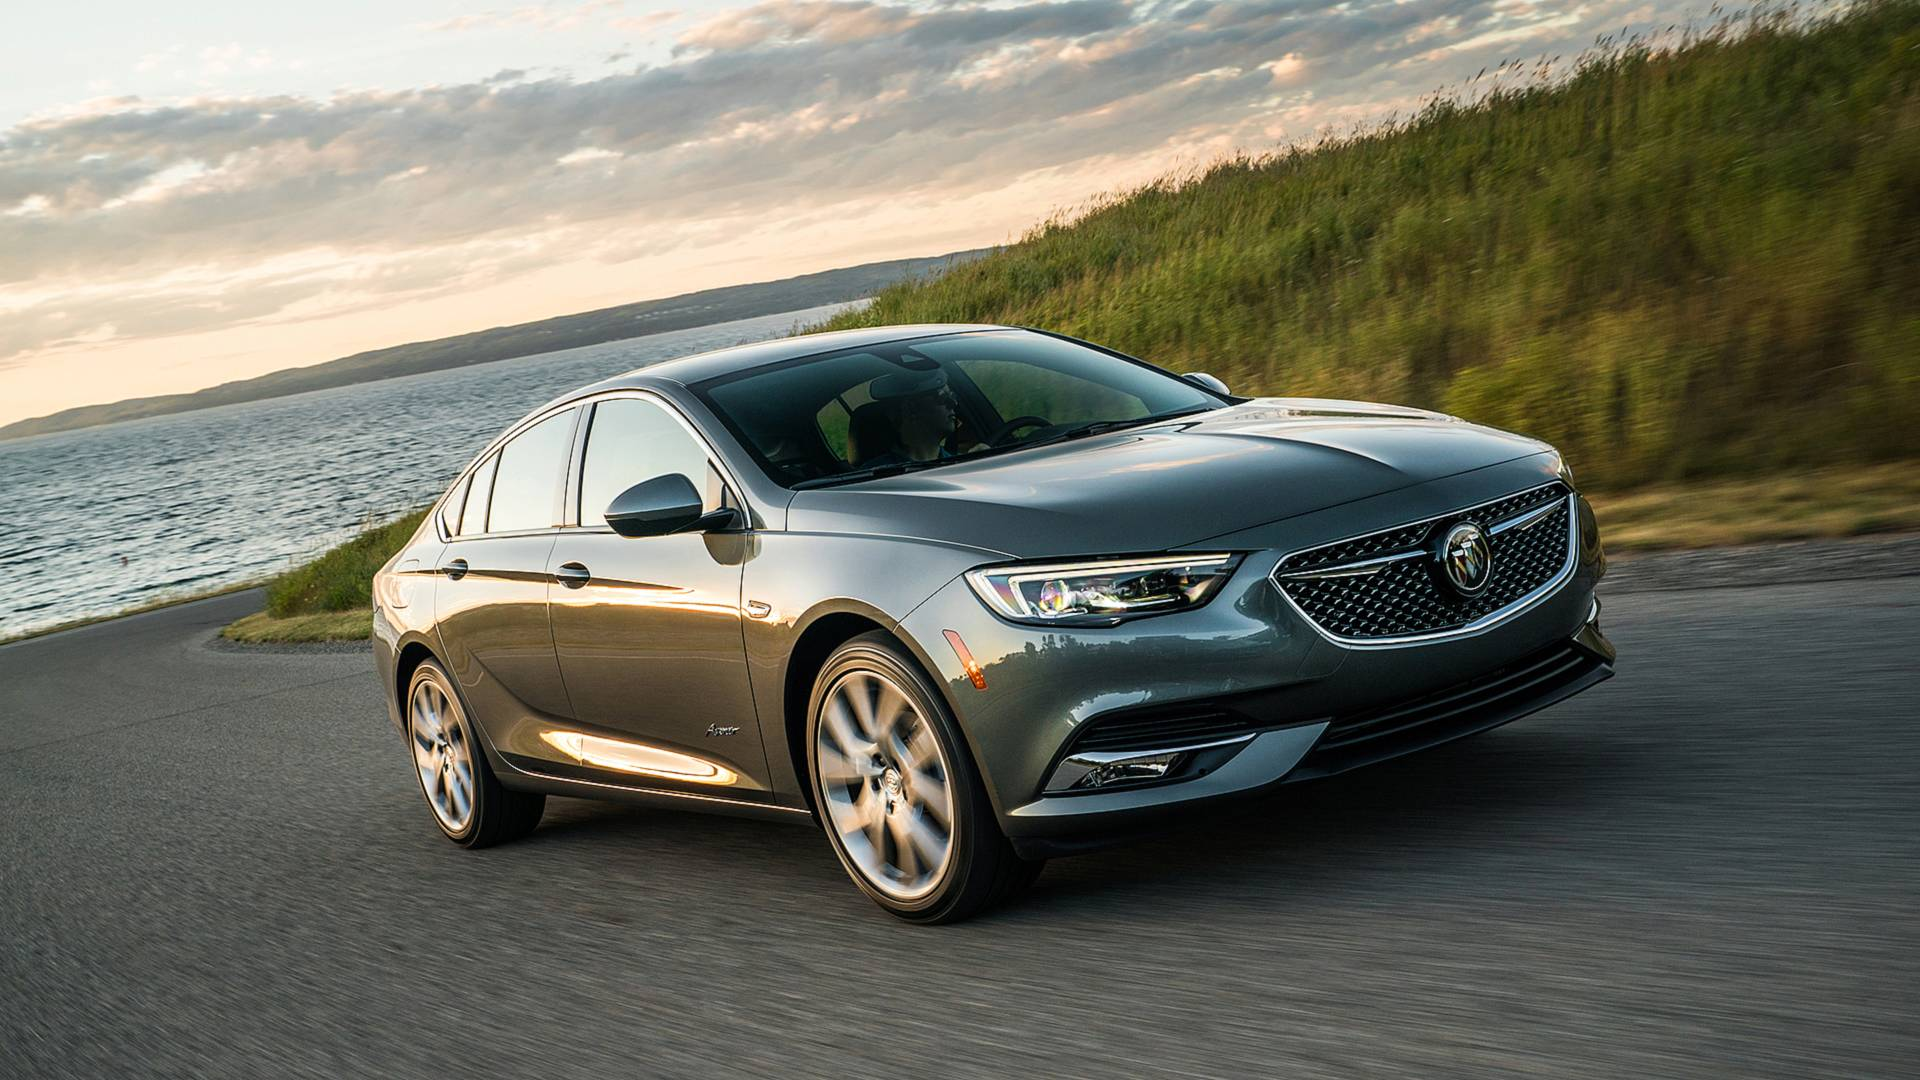 2019 Buick Regal Avenir Priced at $36,195 - autoevolution